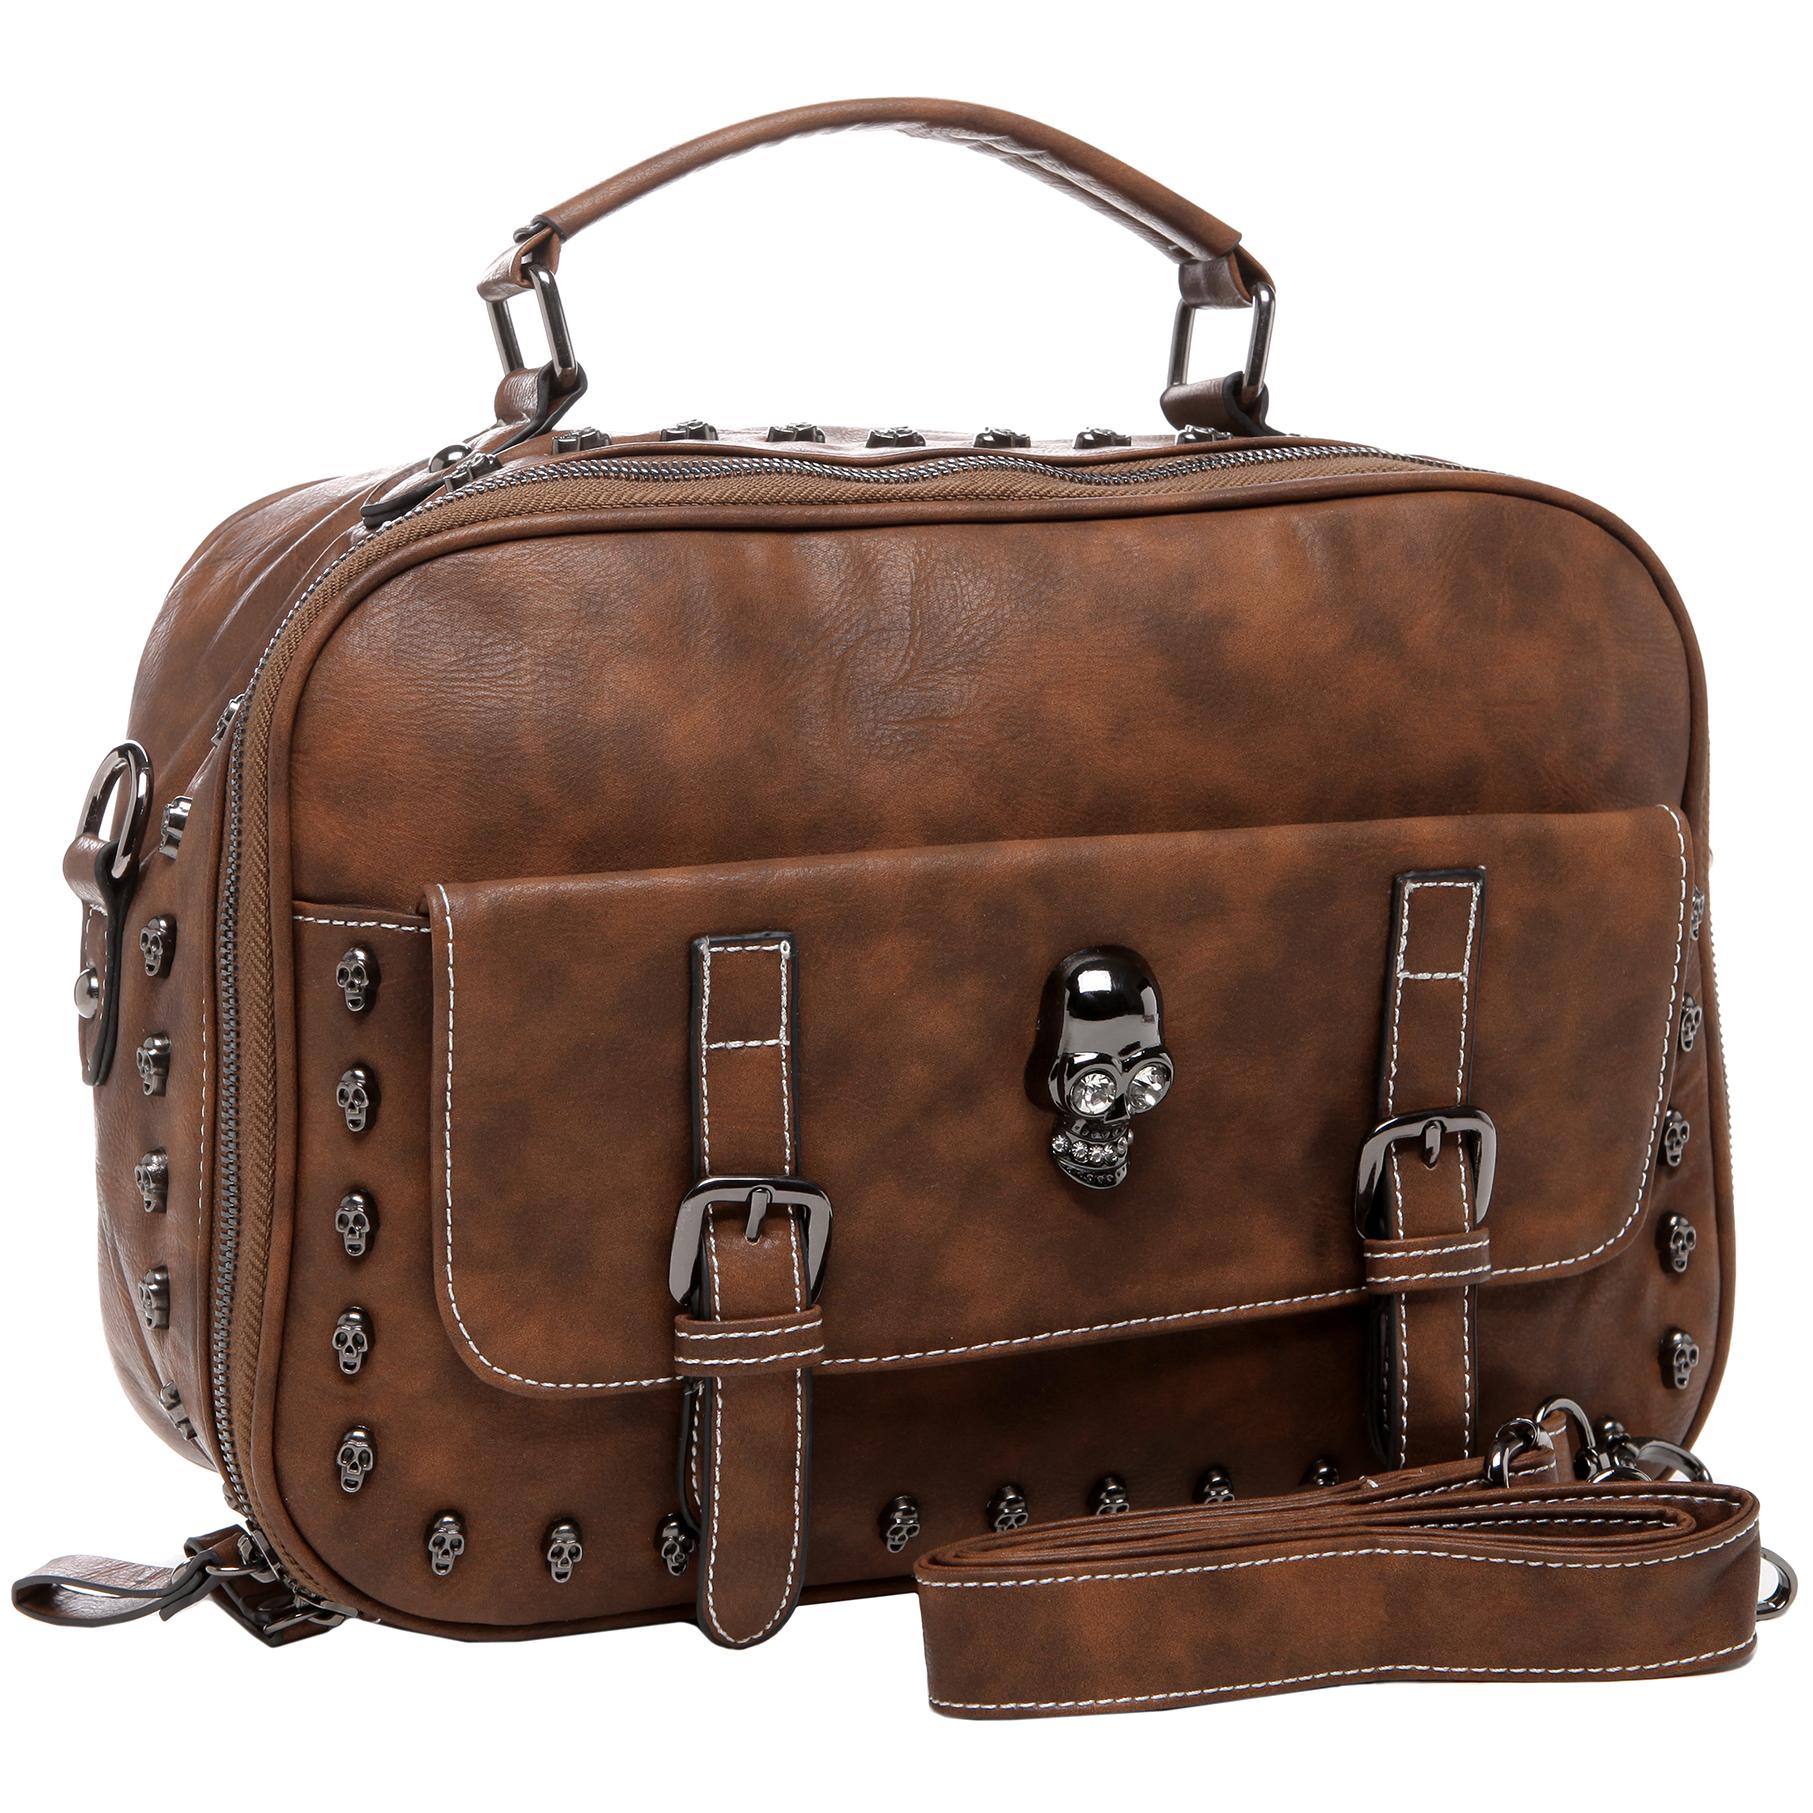 Women's Designer Handbag MASON in Brown Gothic Style Satchel angled image